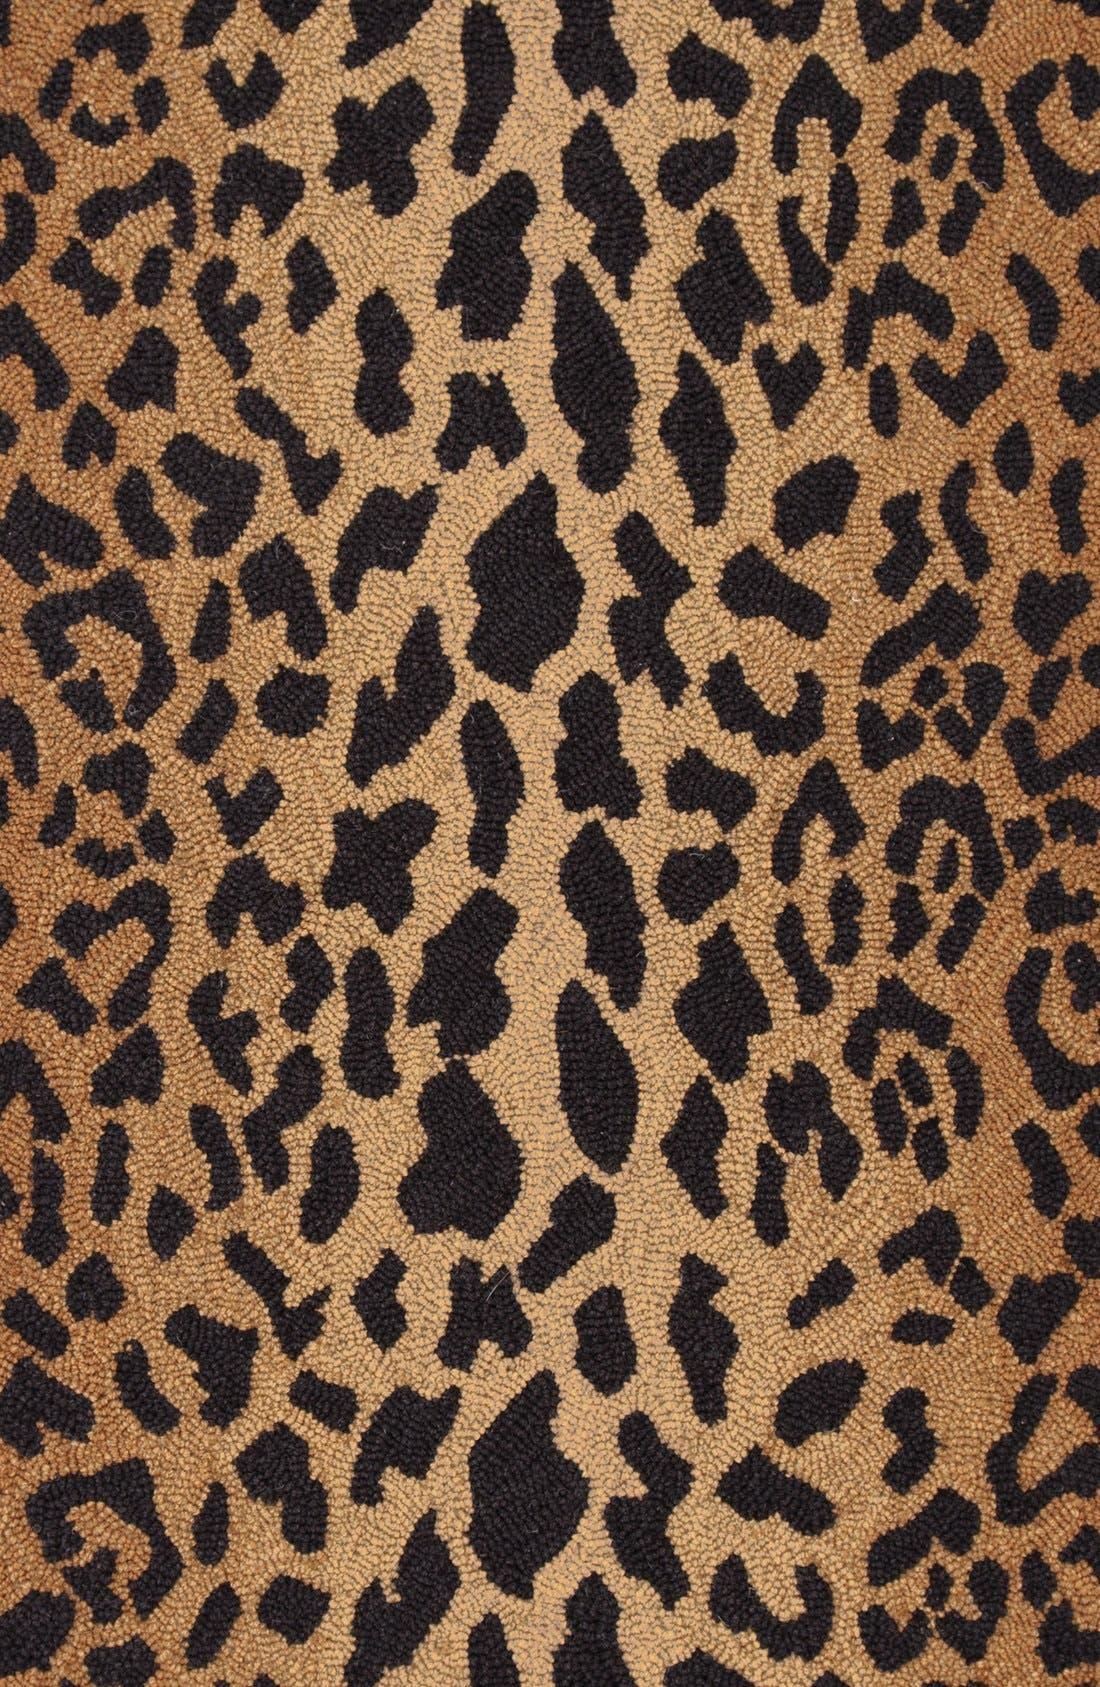 Leopard Print Wool Rug,                             Alternate thumbnail 2, color,                             BROWN